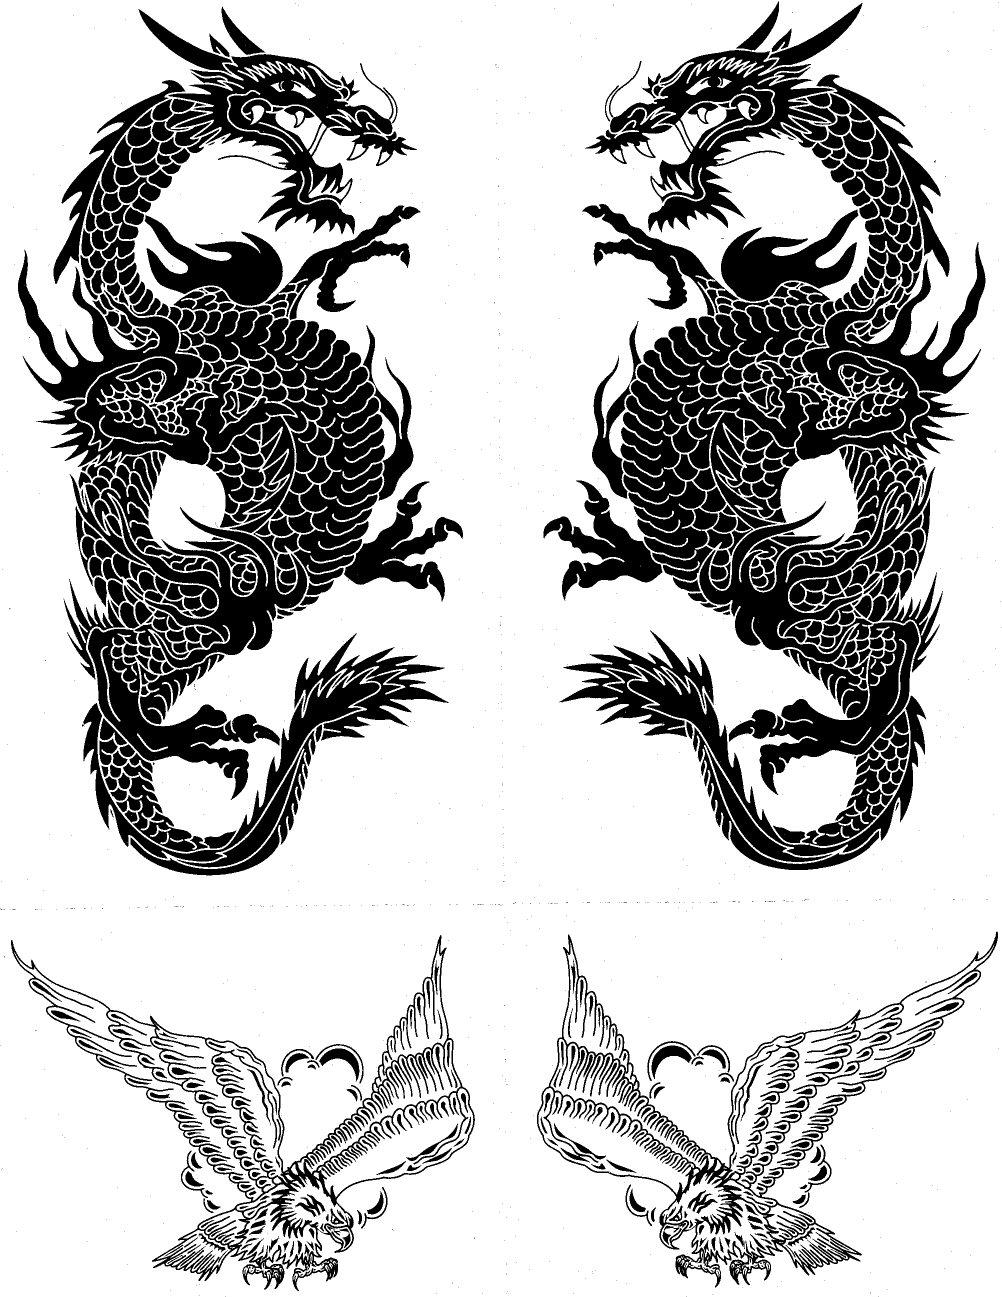 Henna Tattoo Designs Black: THE BLACK TATTOOS: Dark Henna Tattoos